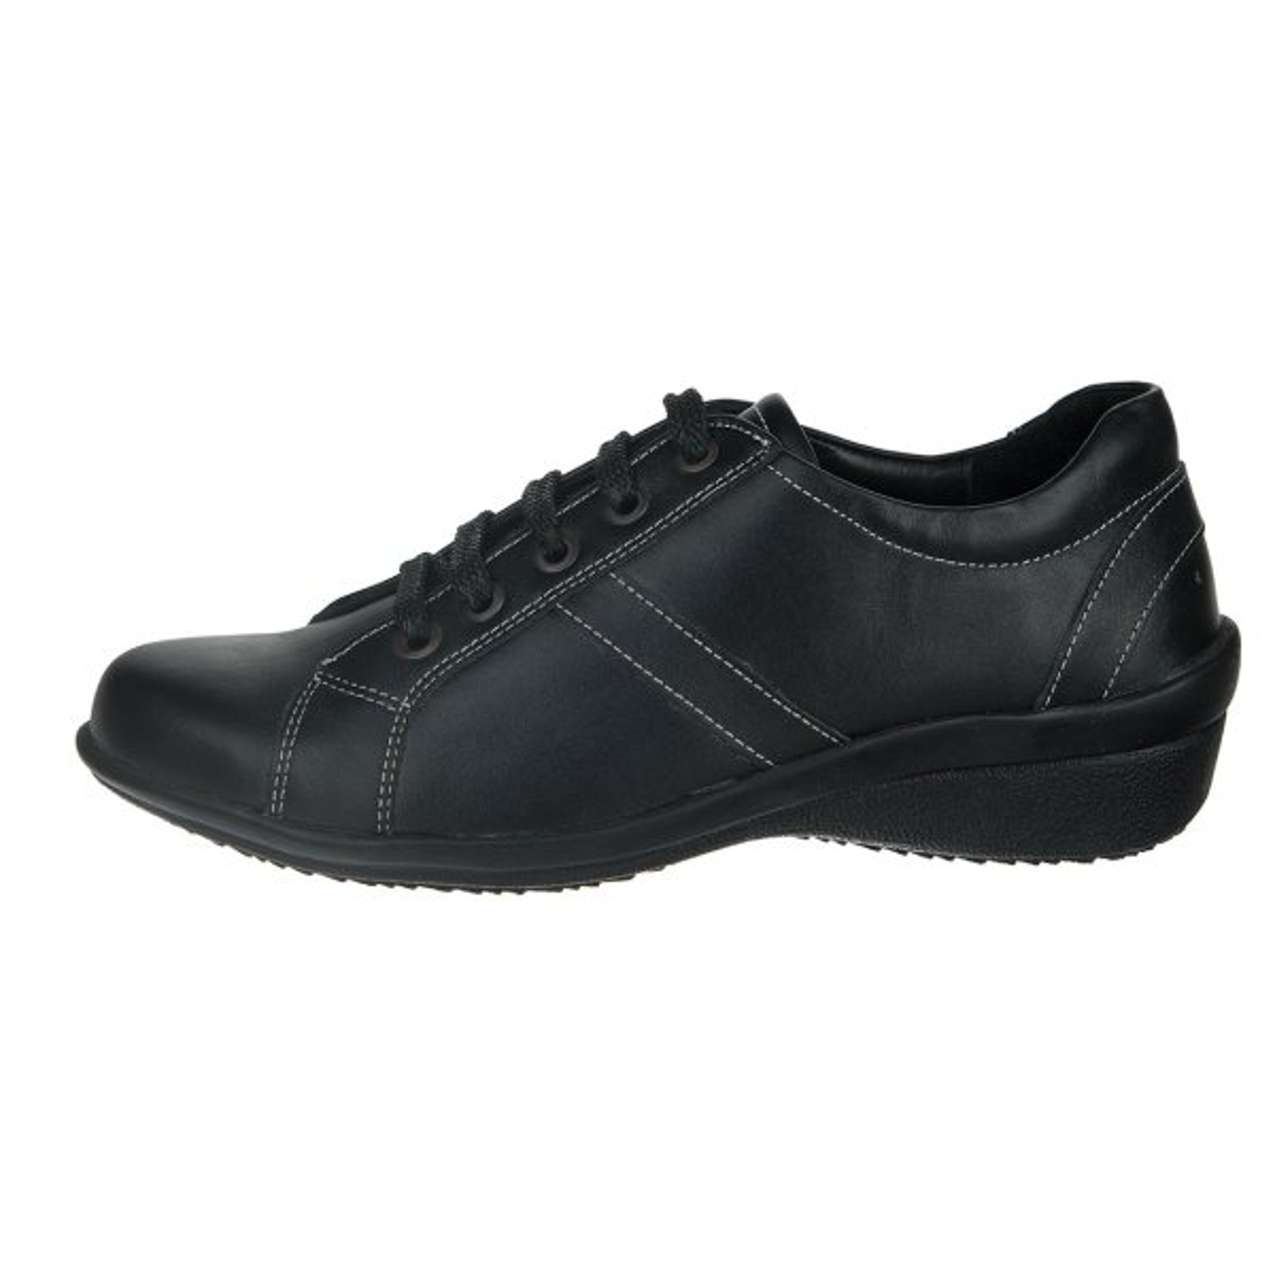 کفش روزمره زنانه شیفر مدل 5096A-BL